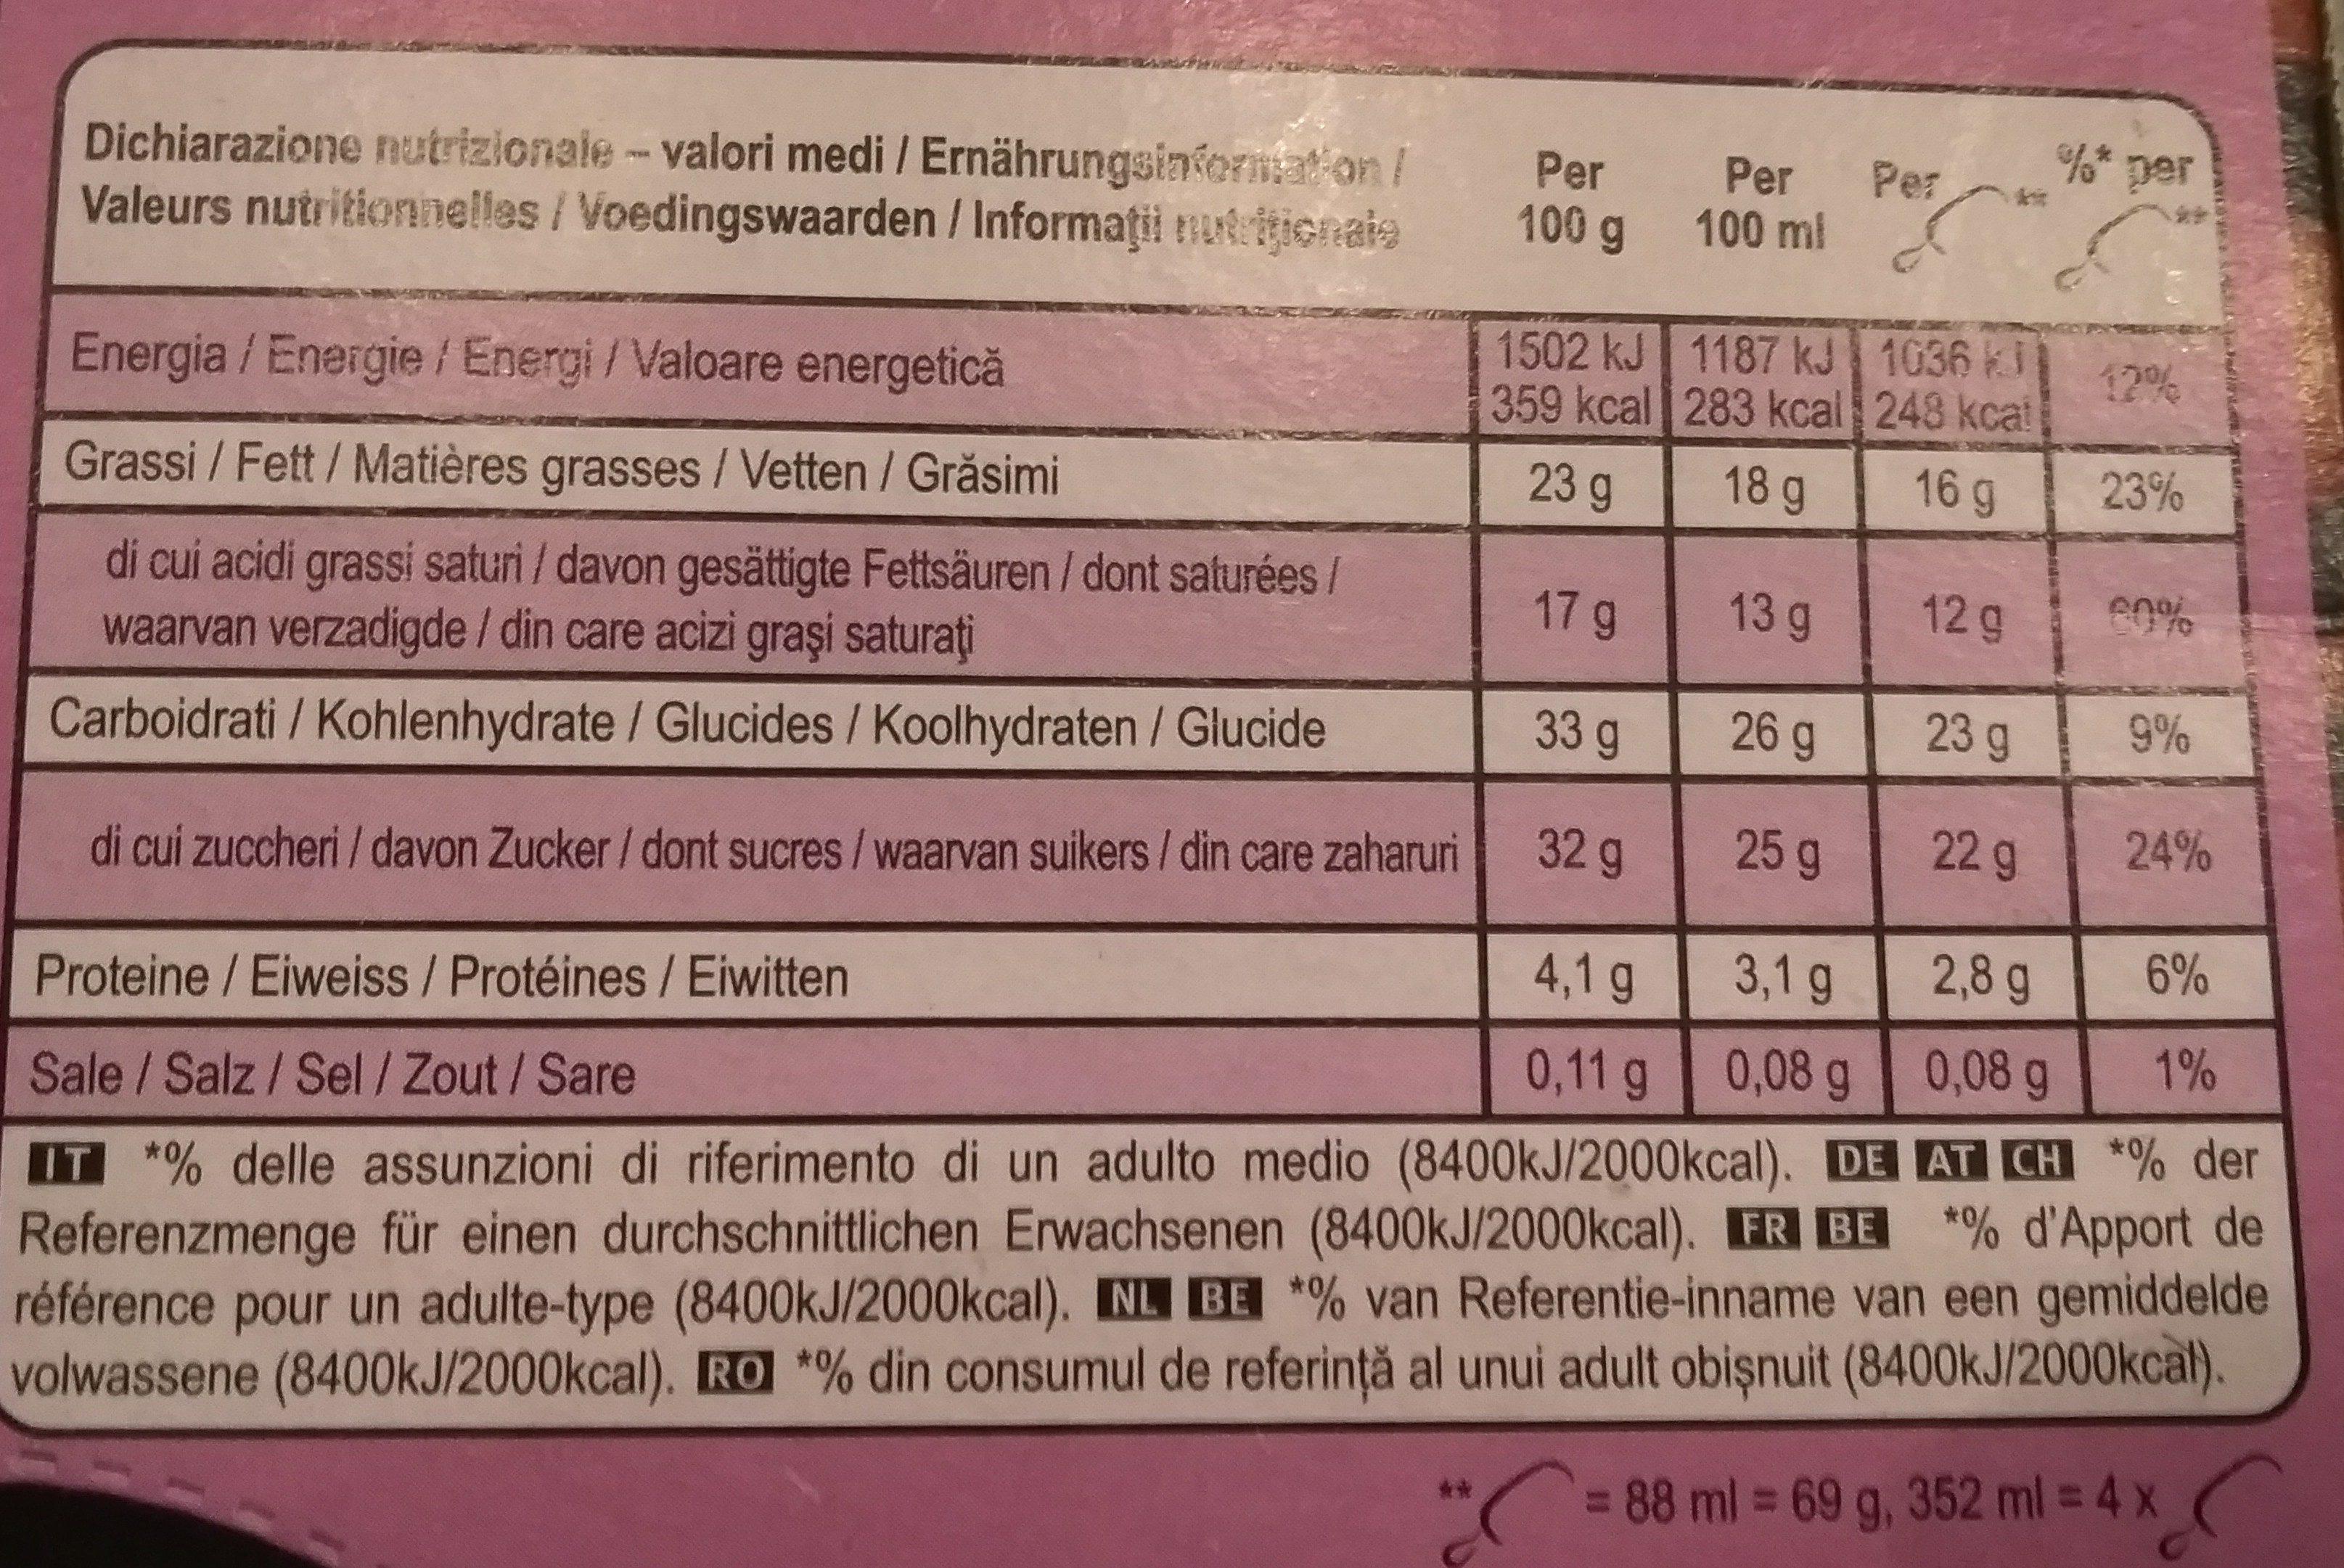 Magnum Batonnet Glace Double Chocolat x 4 352 ml - Voedingswaarden